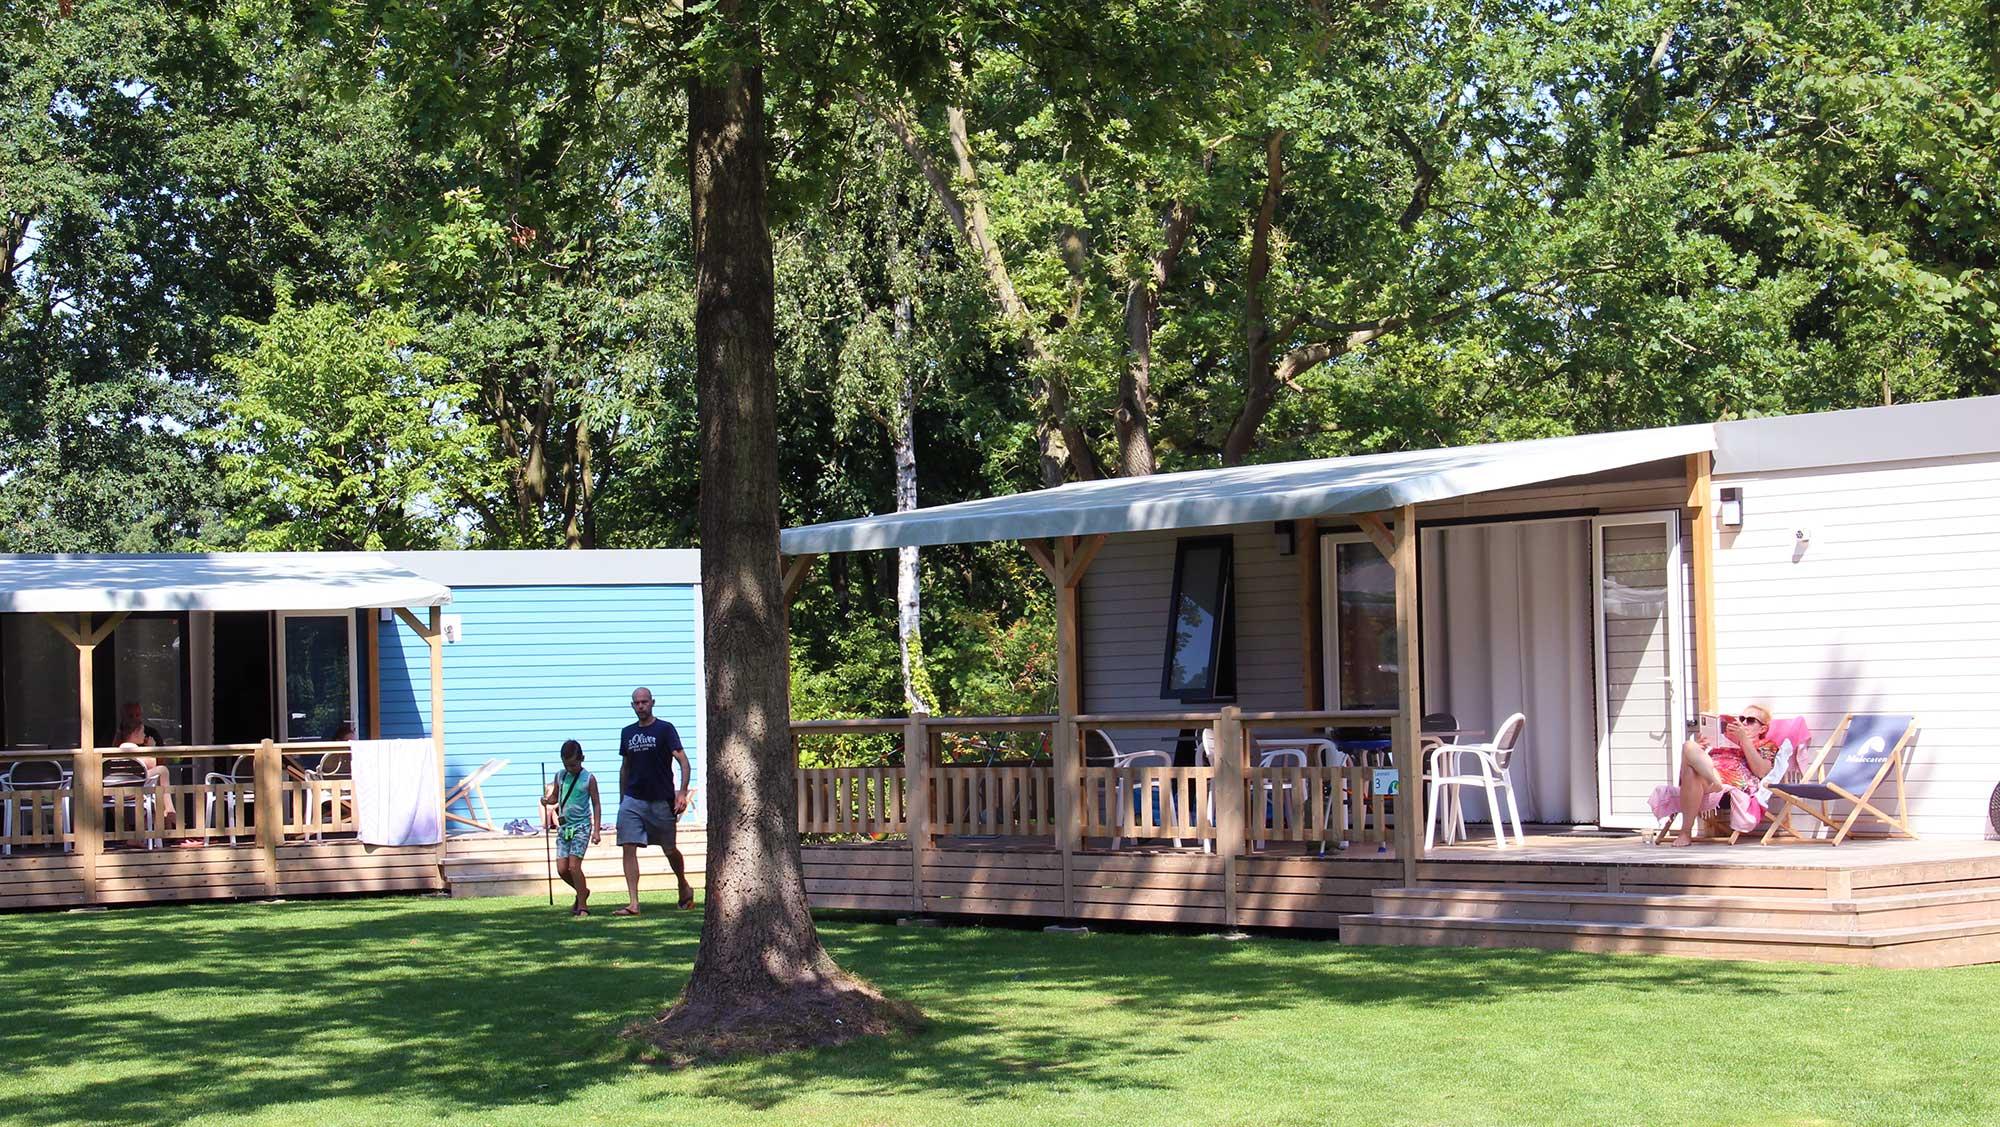 6pers chalet Lavendel Molecaten Park Bosbad Hoeven 01